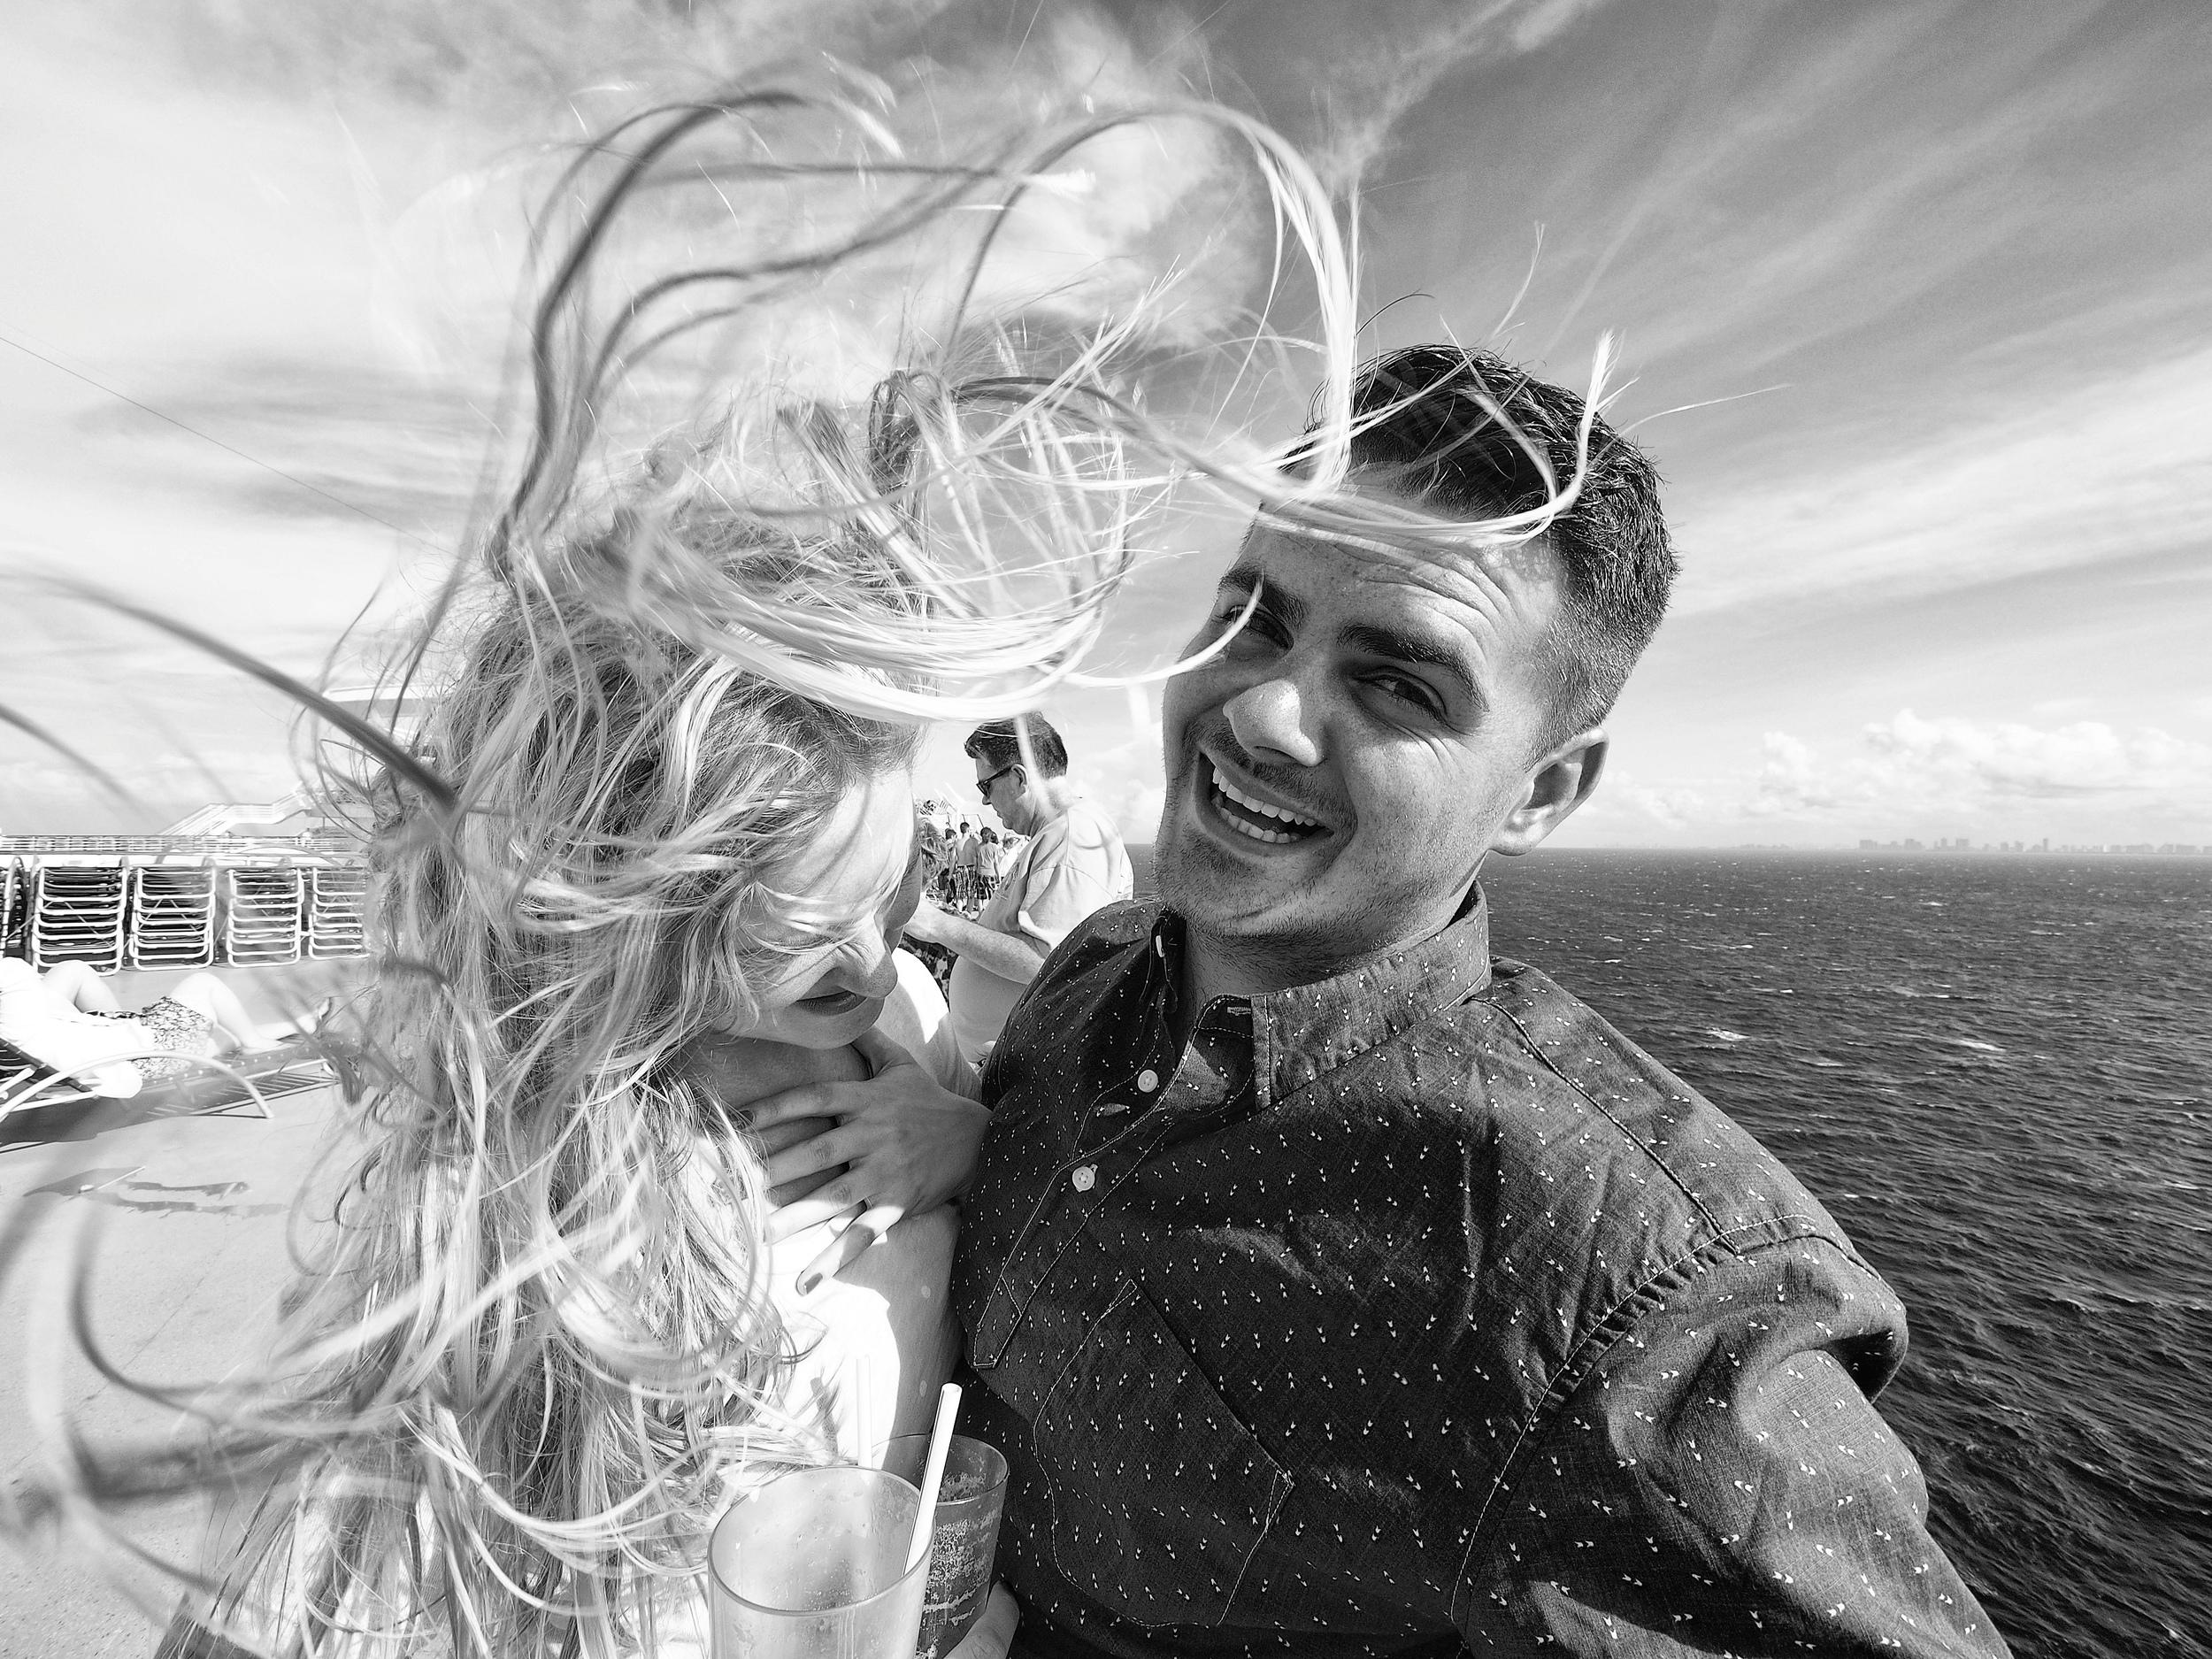 windy ship